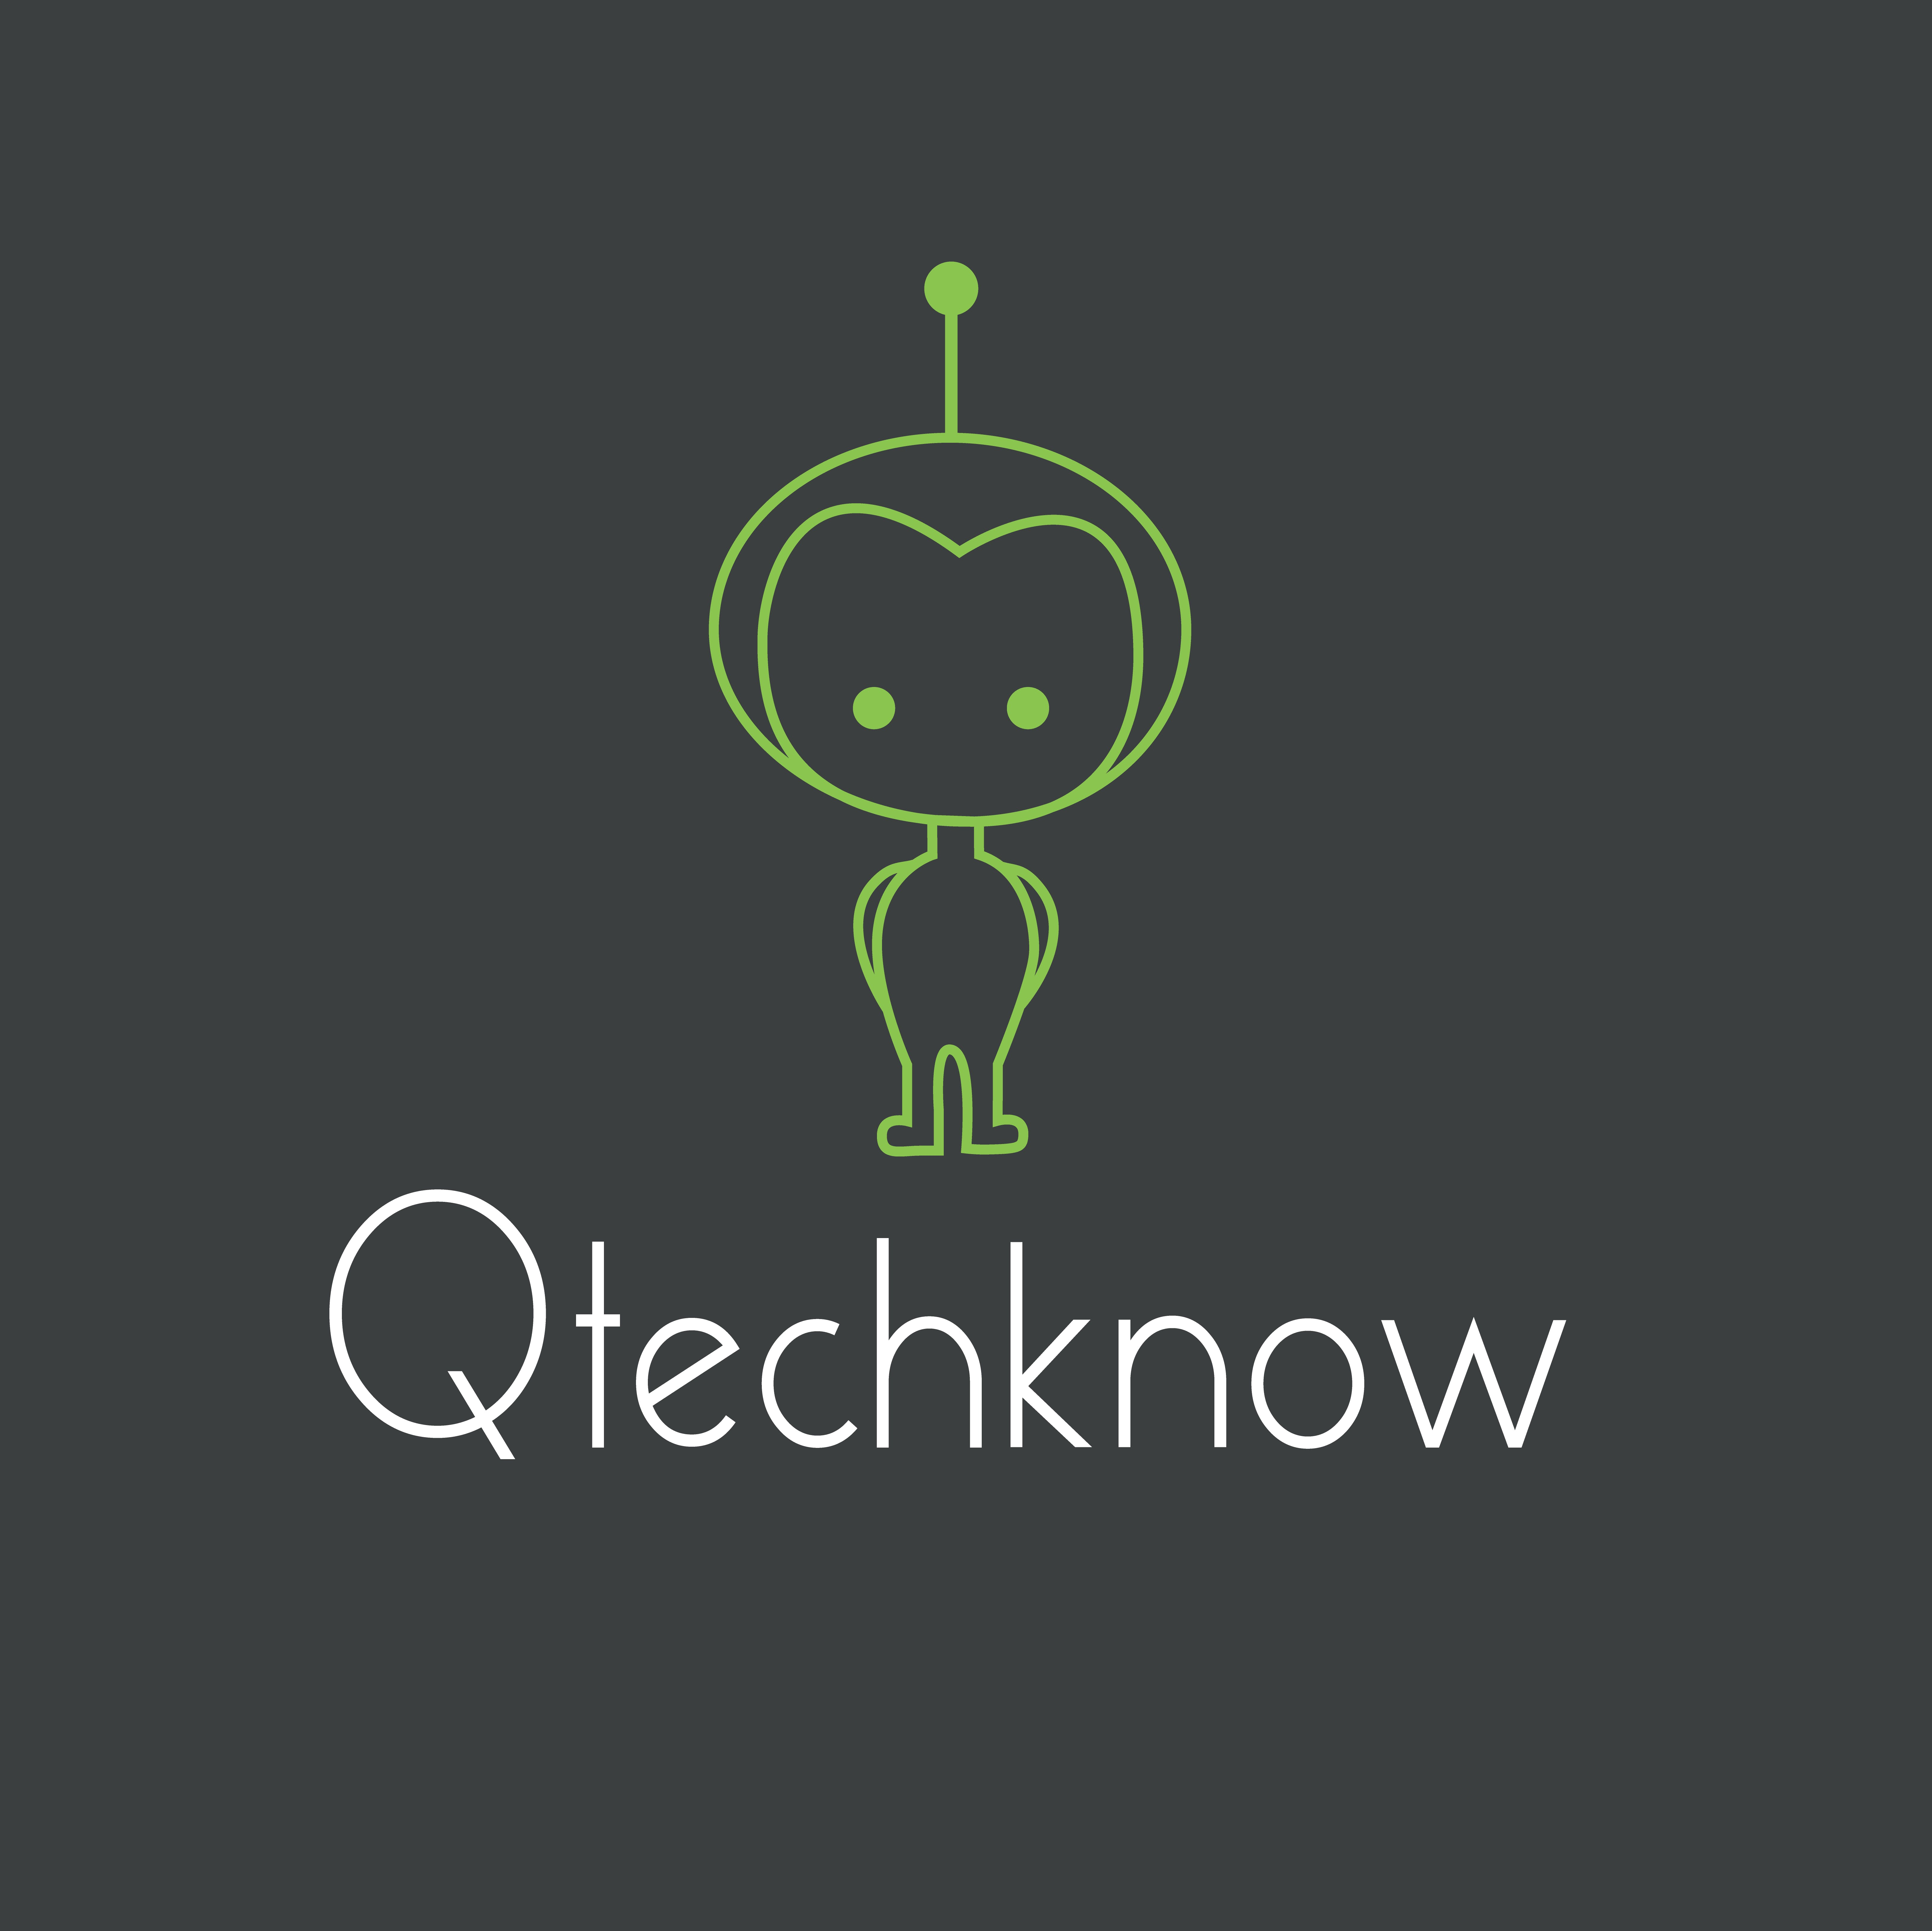 Qtechknow logo v3